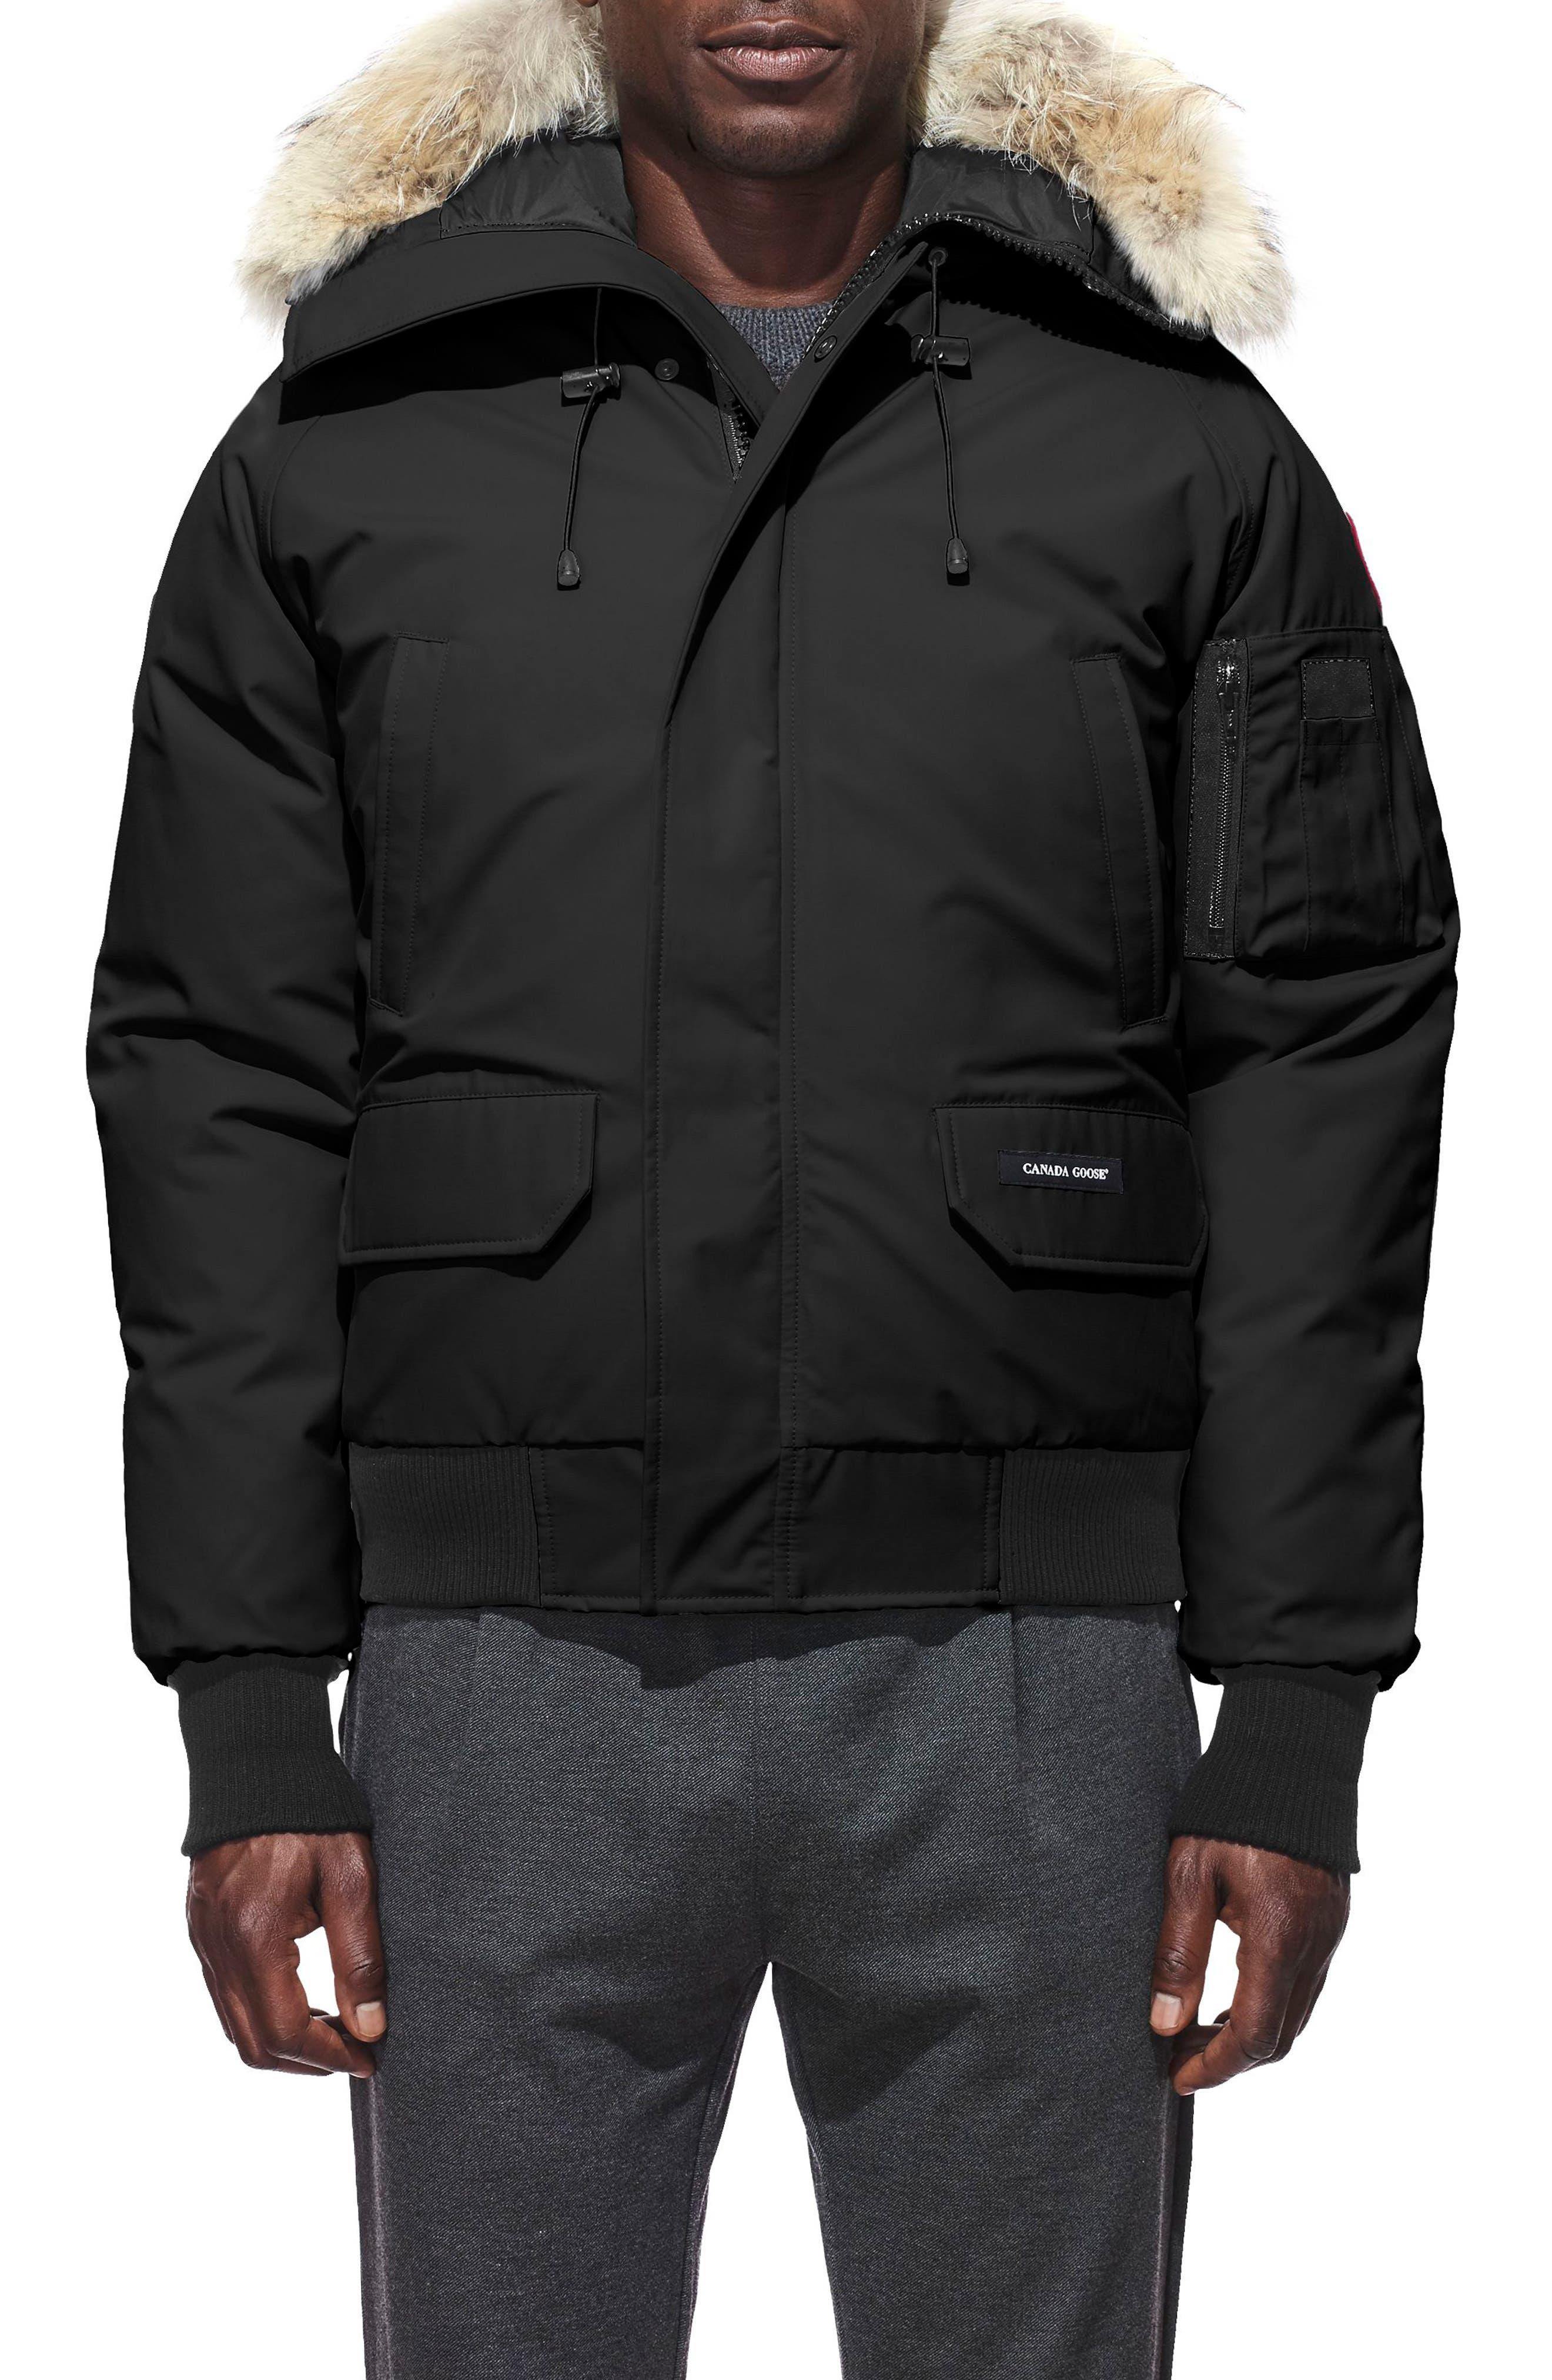 CANADA GOOSE PBI Chilliwack Regular Fit Down Bomber Jacket with Genuine Coyote Trim, Main, color, BLACK